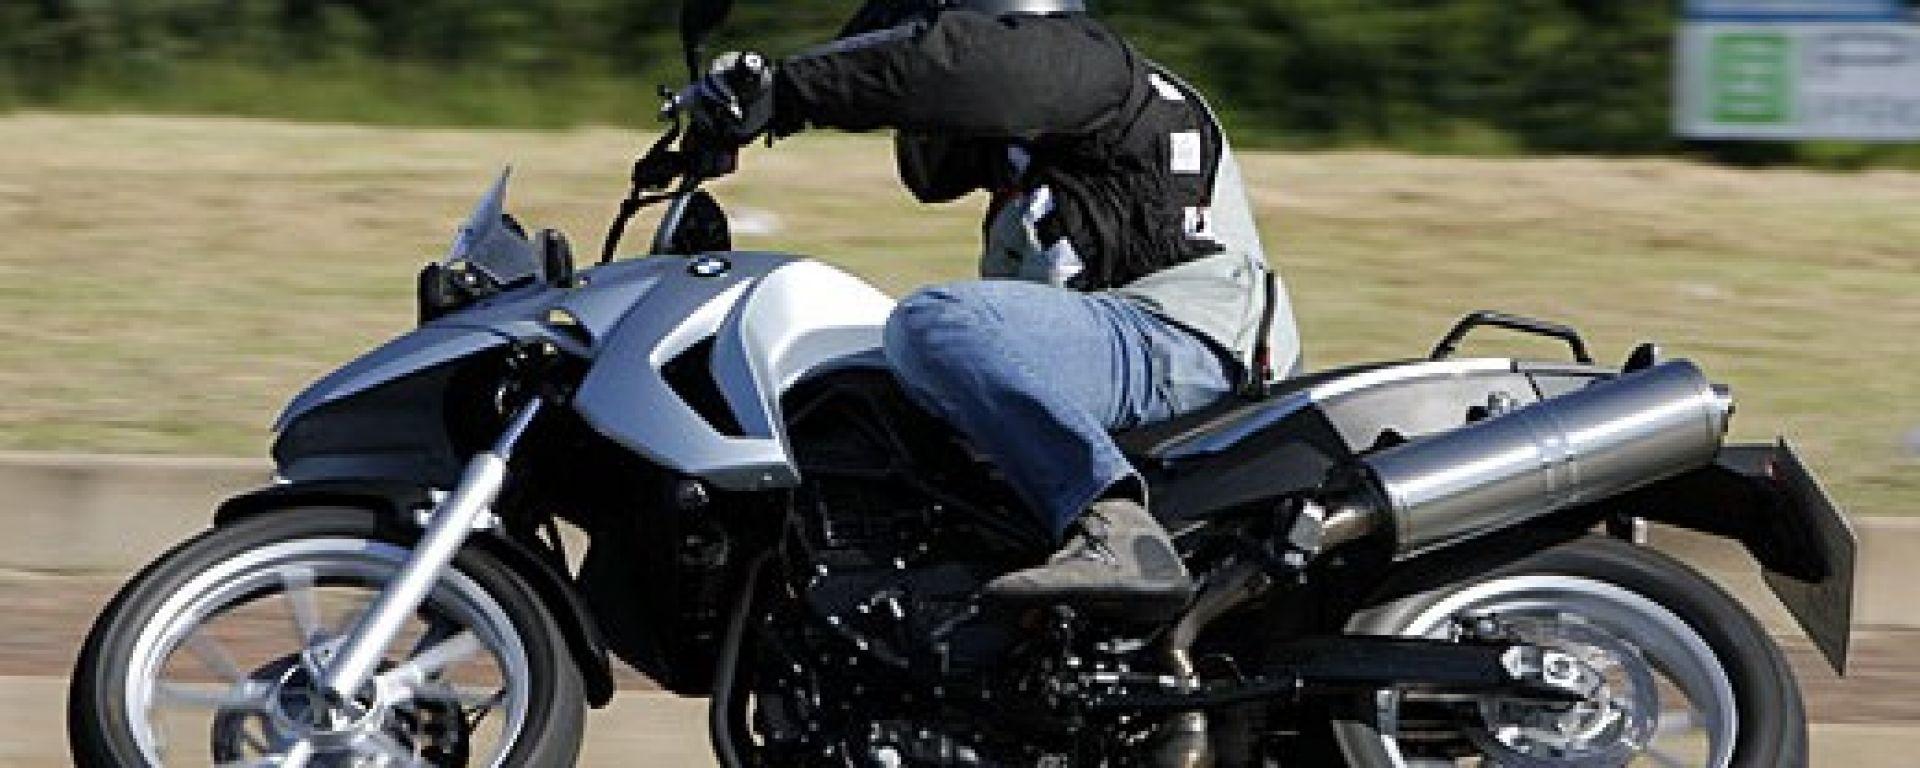 BMW Motorrad F 650 GS